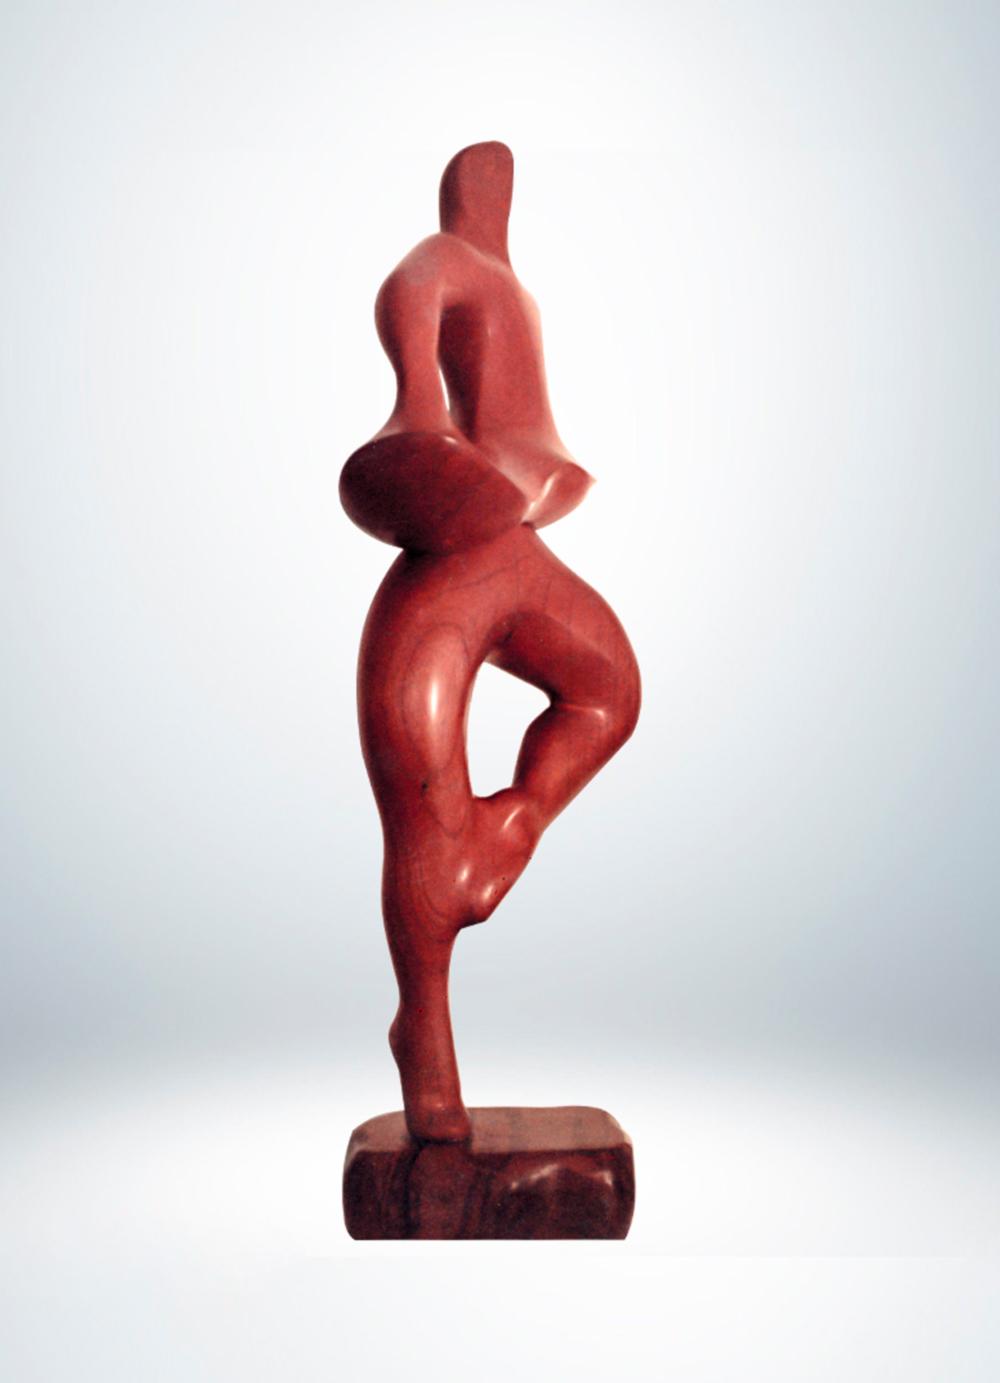 Escultura-Bailarin-Cedro-B-Figurativo-Abstracto-RD.Escultor